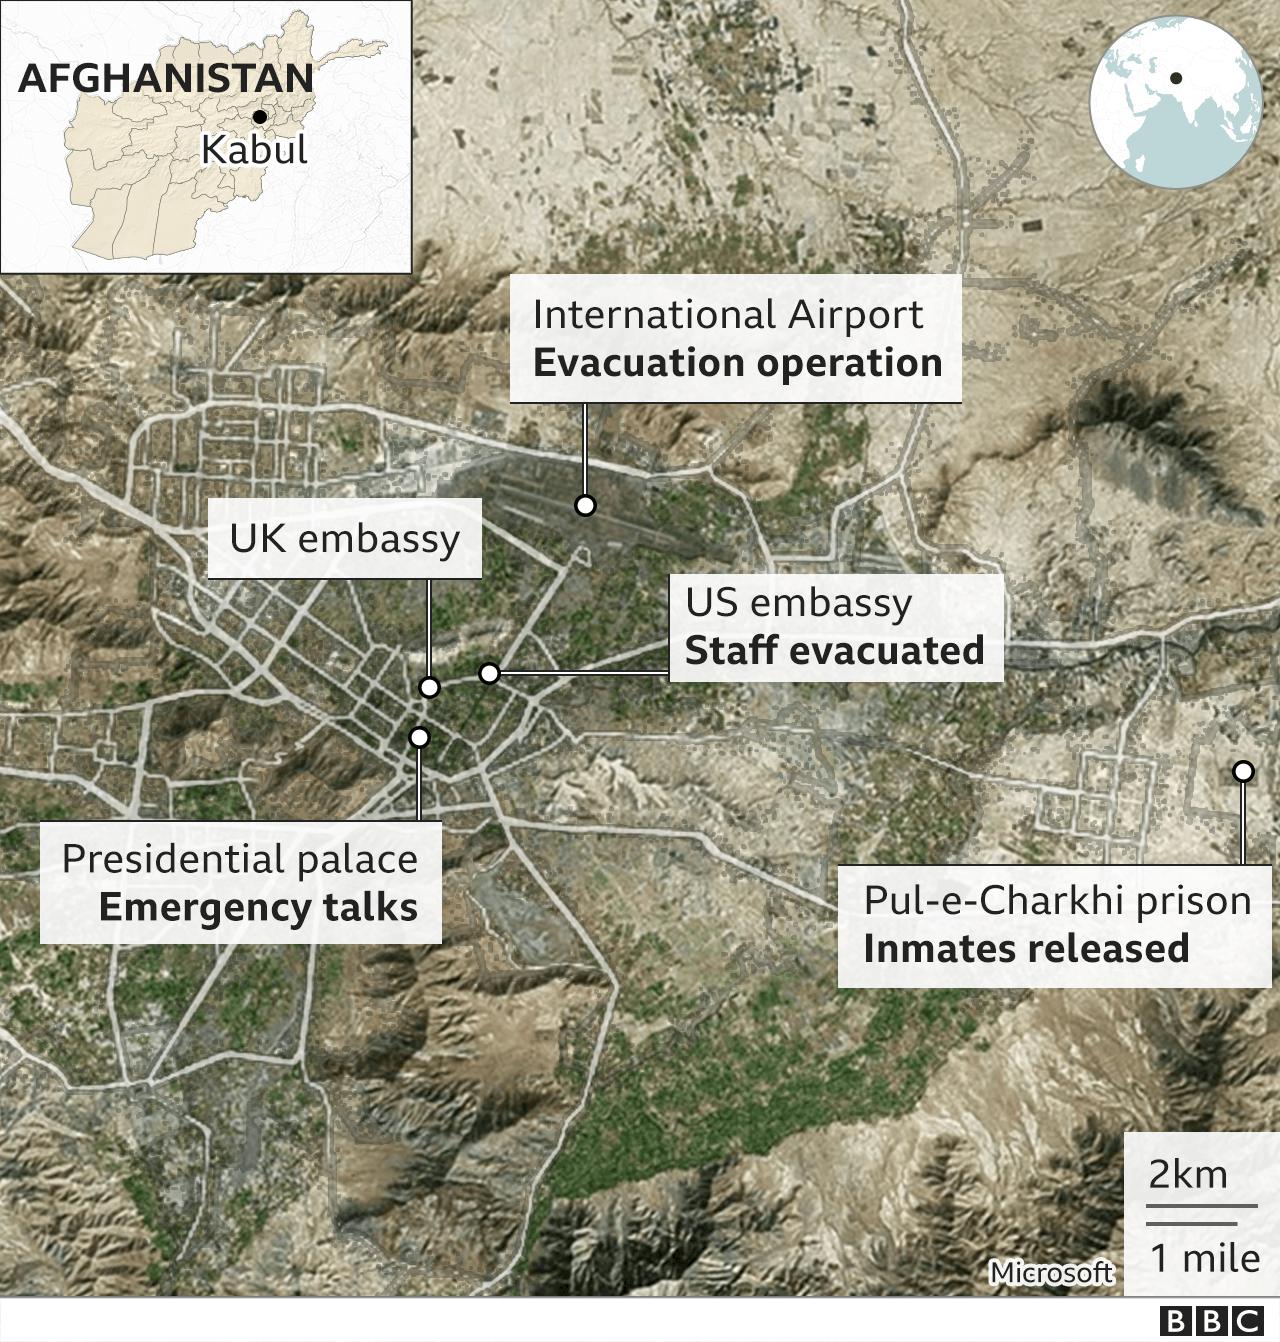 Map of Kabul